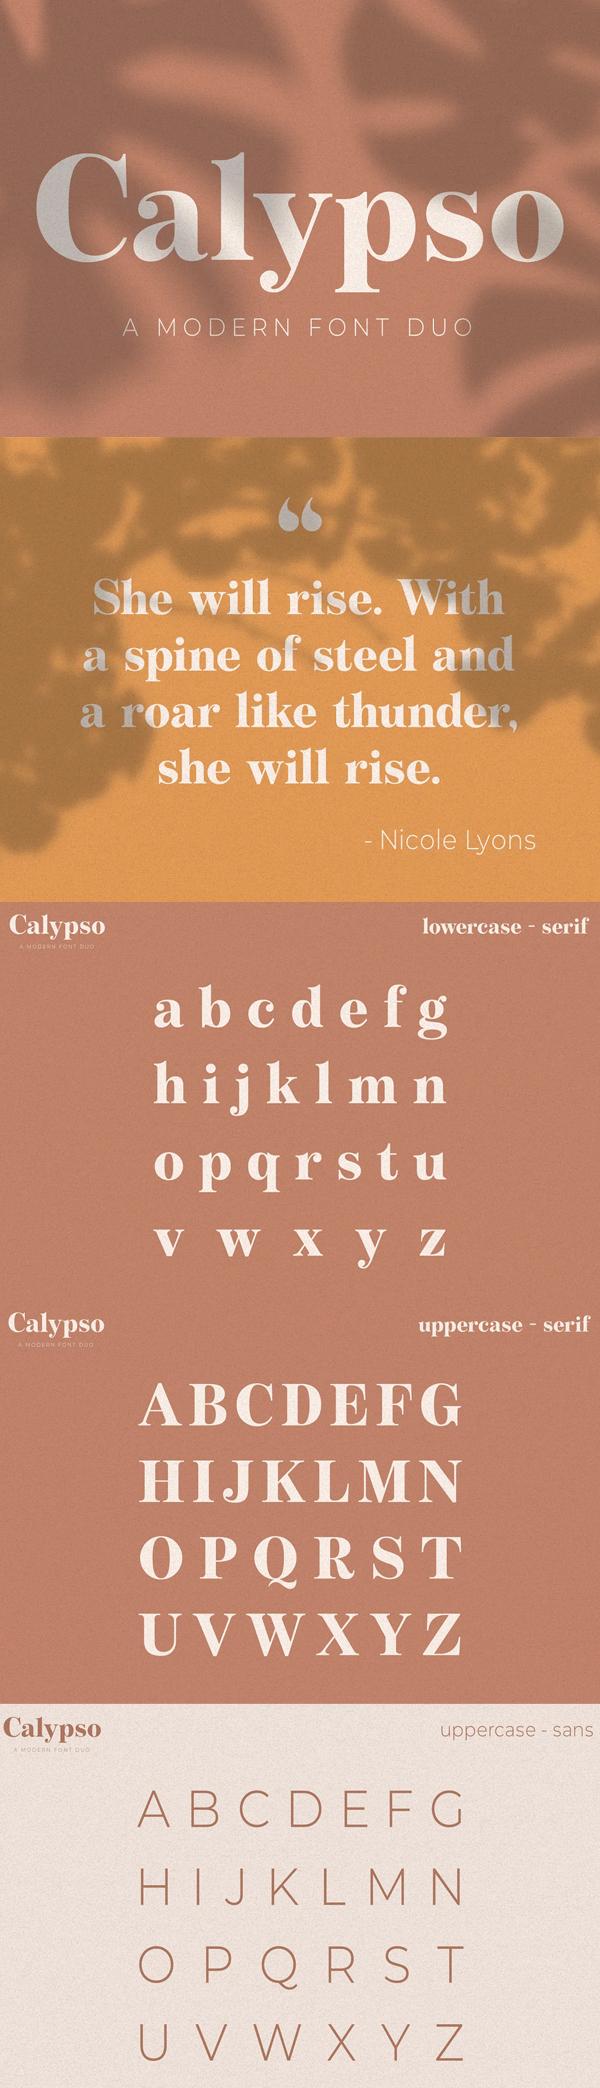 Calypso A Modern Font Duo